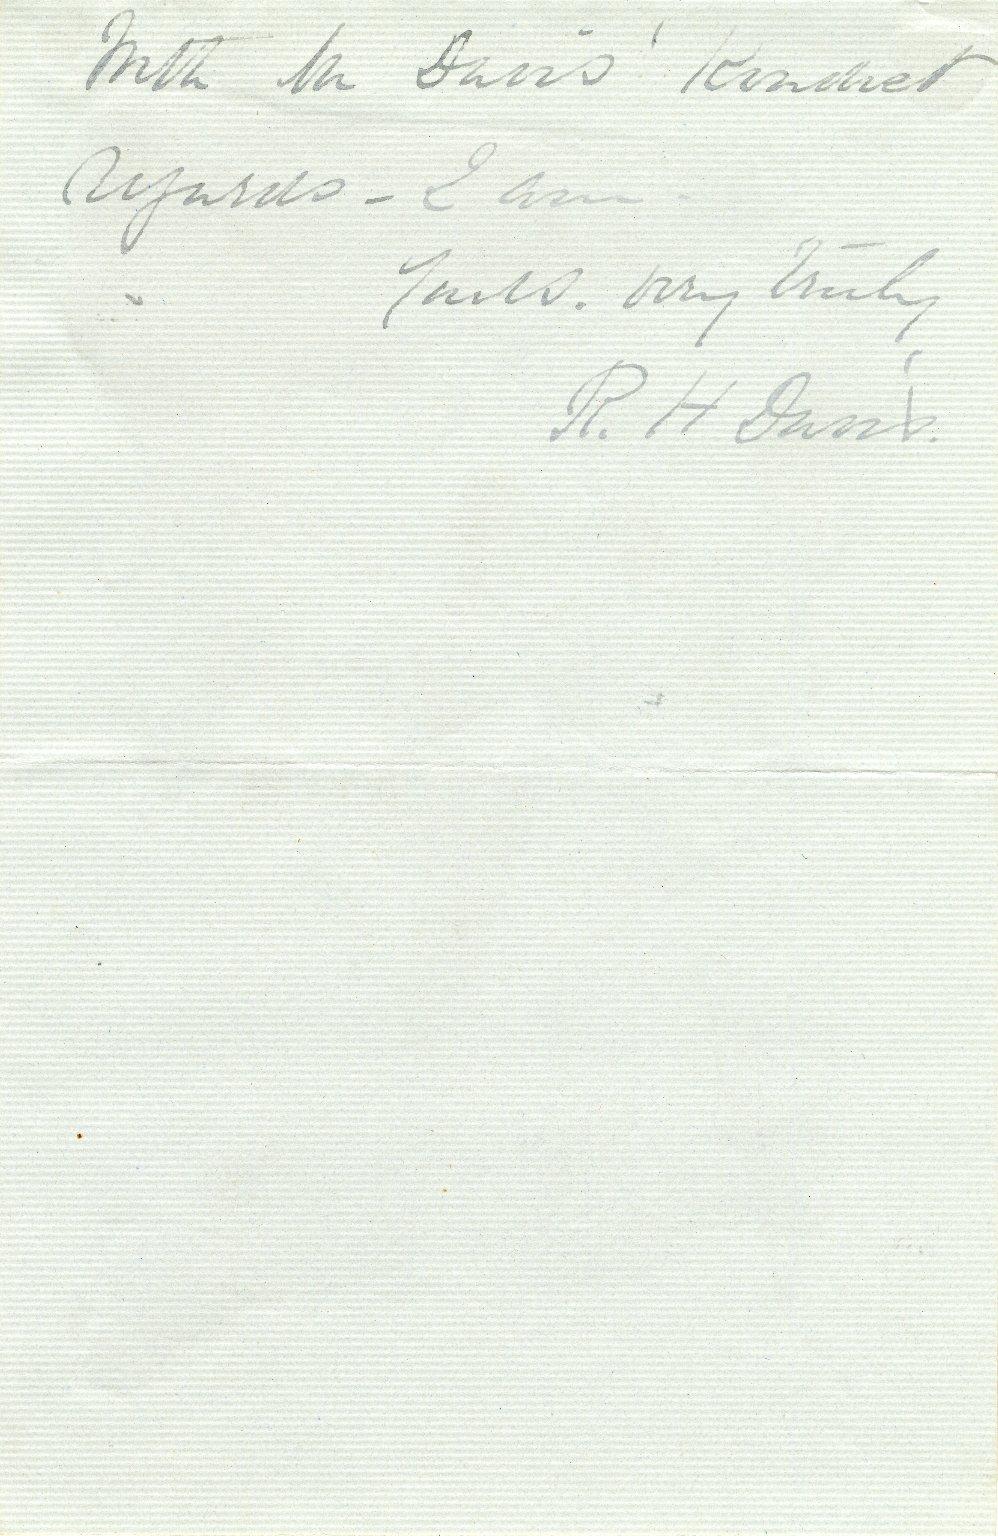 Davis, Rebecca Harding. ALS, 2 1/2 pages, [March 23].